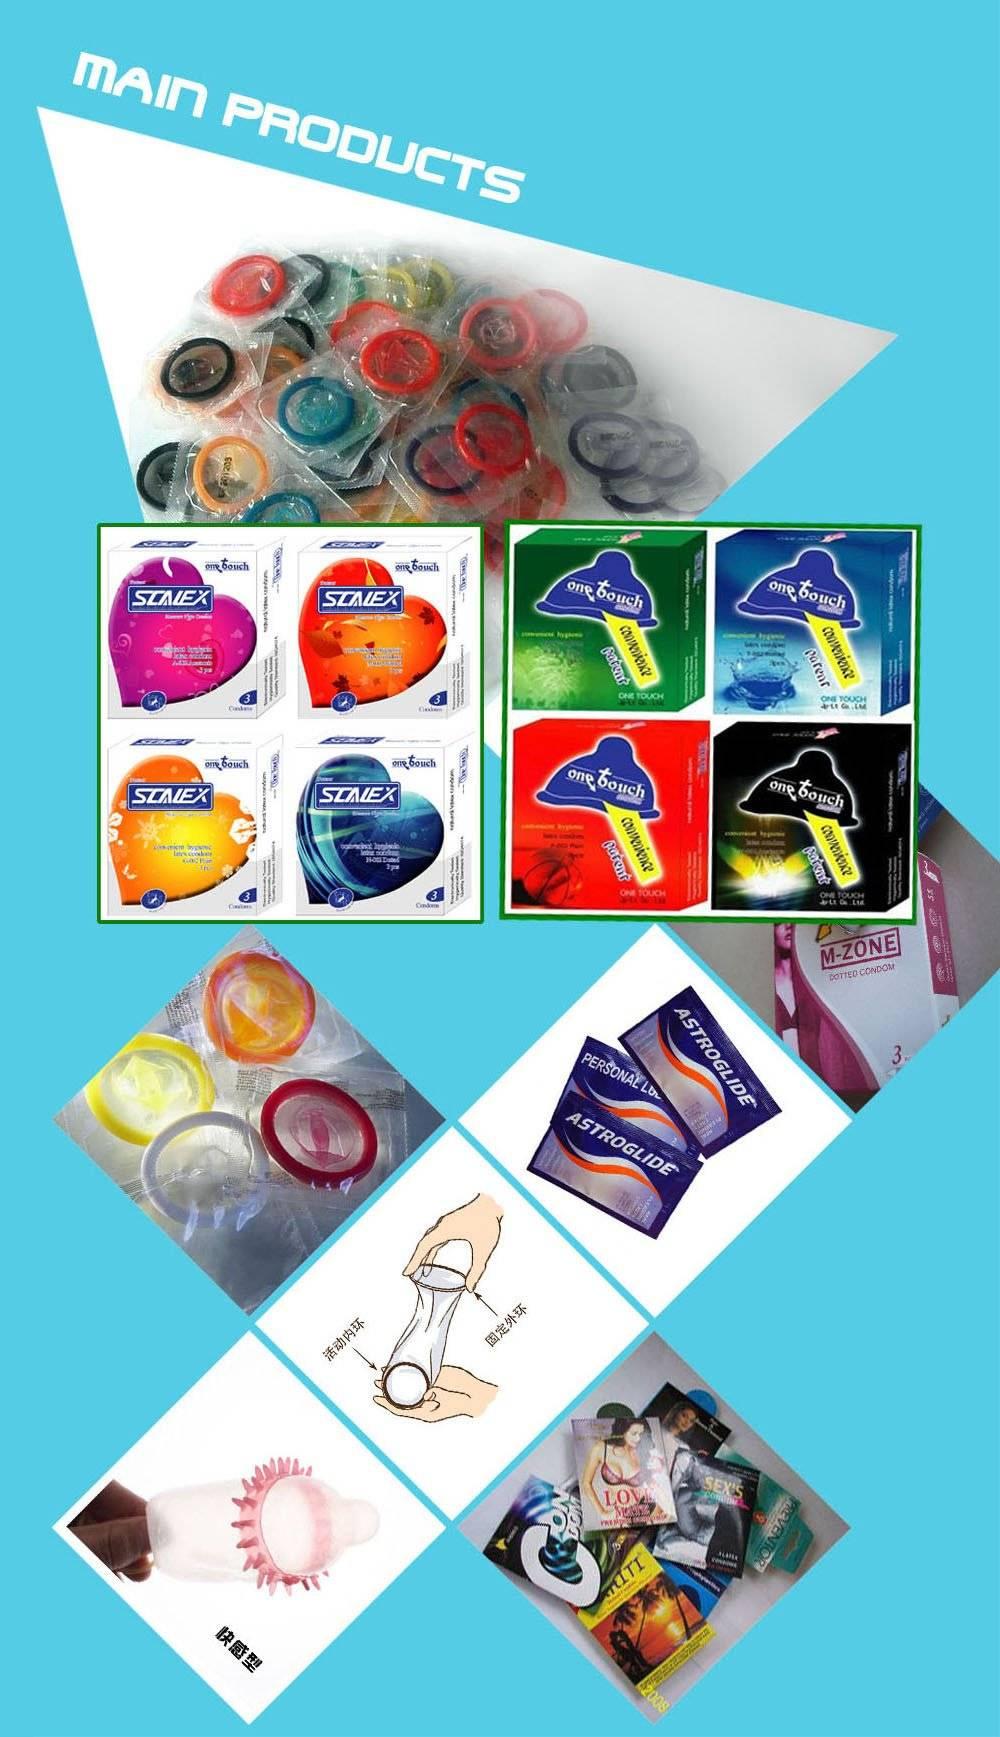 free colored condoms, free condoms, free sample vibrators